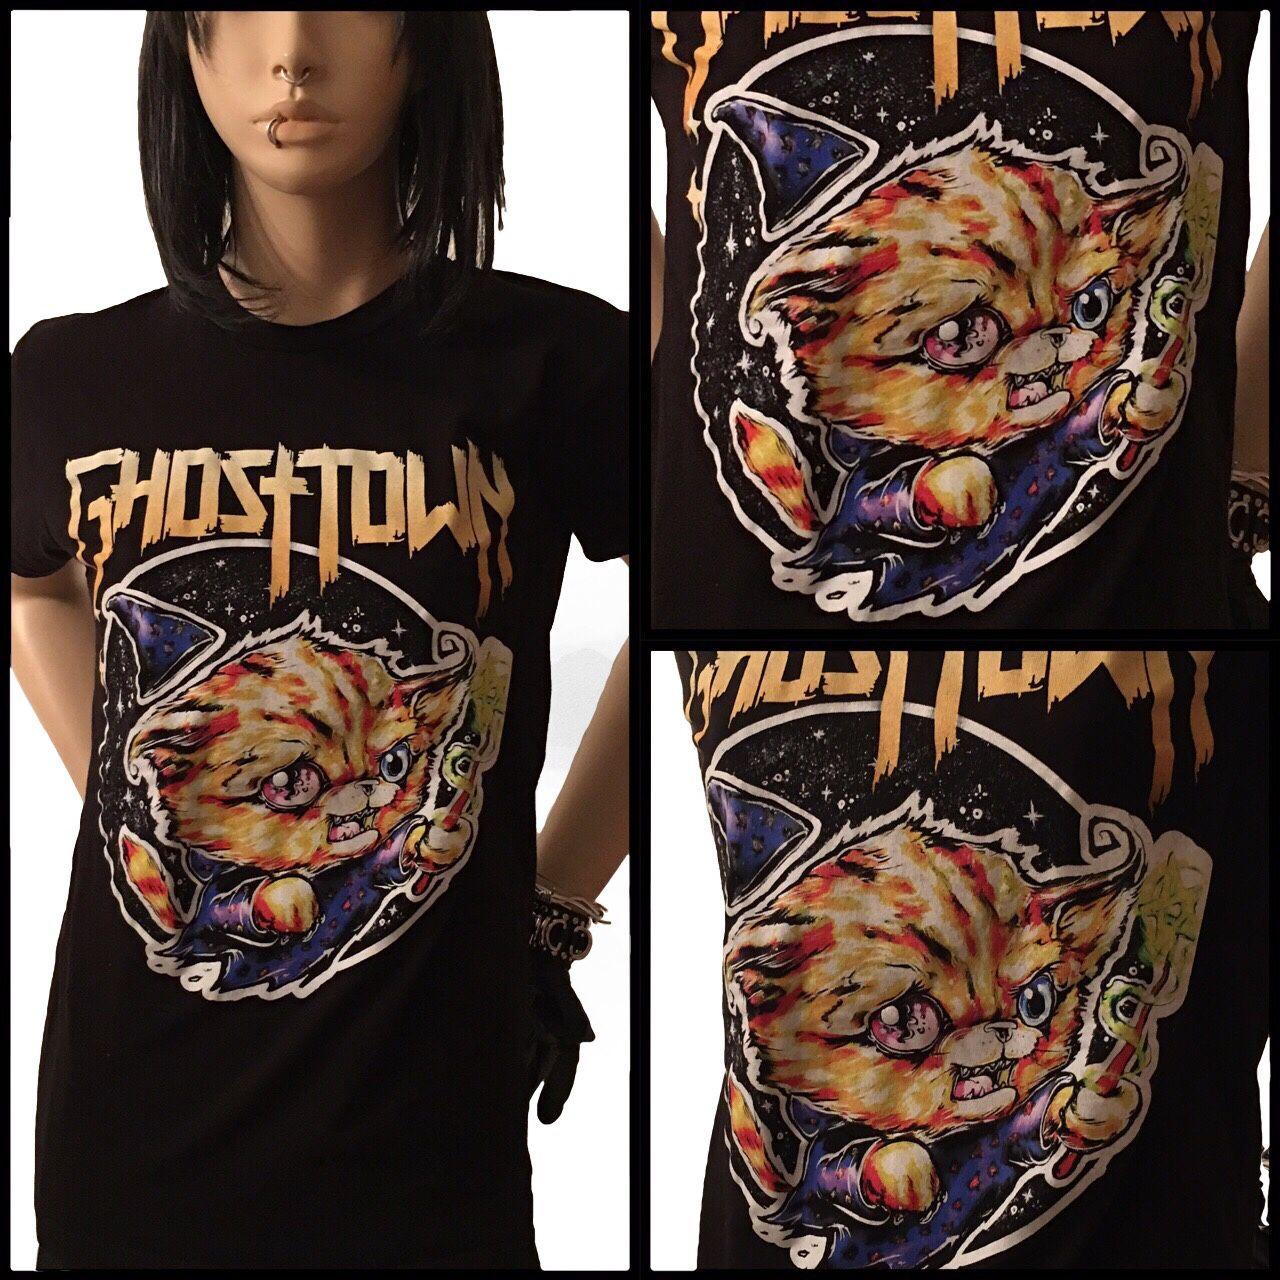 Ghosttown wizard cat shirt unisex size small ghosttownshirt